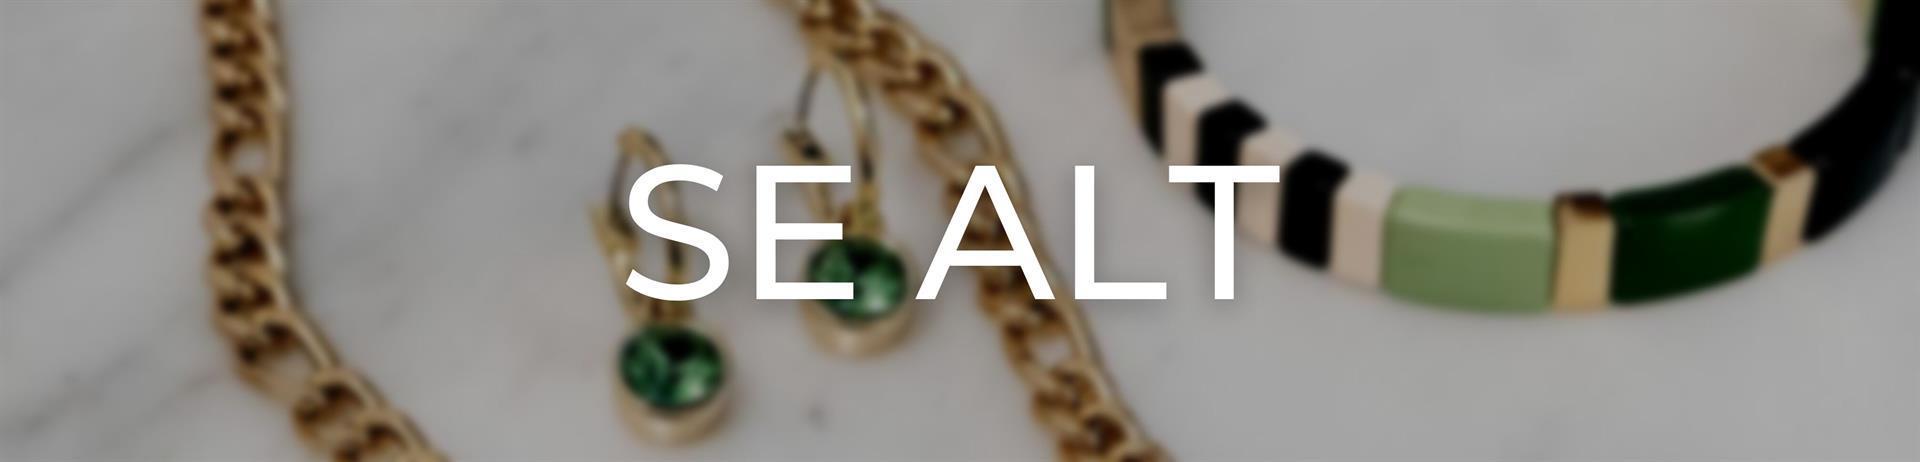 Askepott Interiør - alle smykker